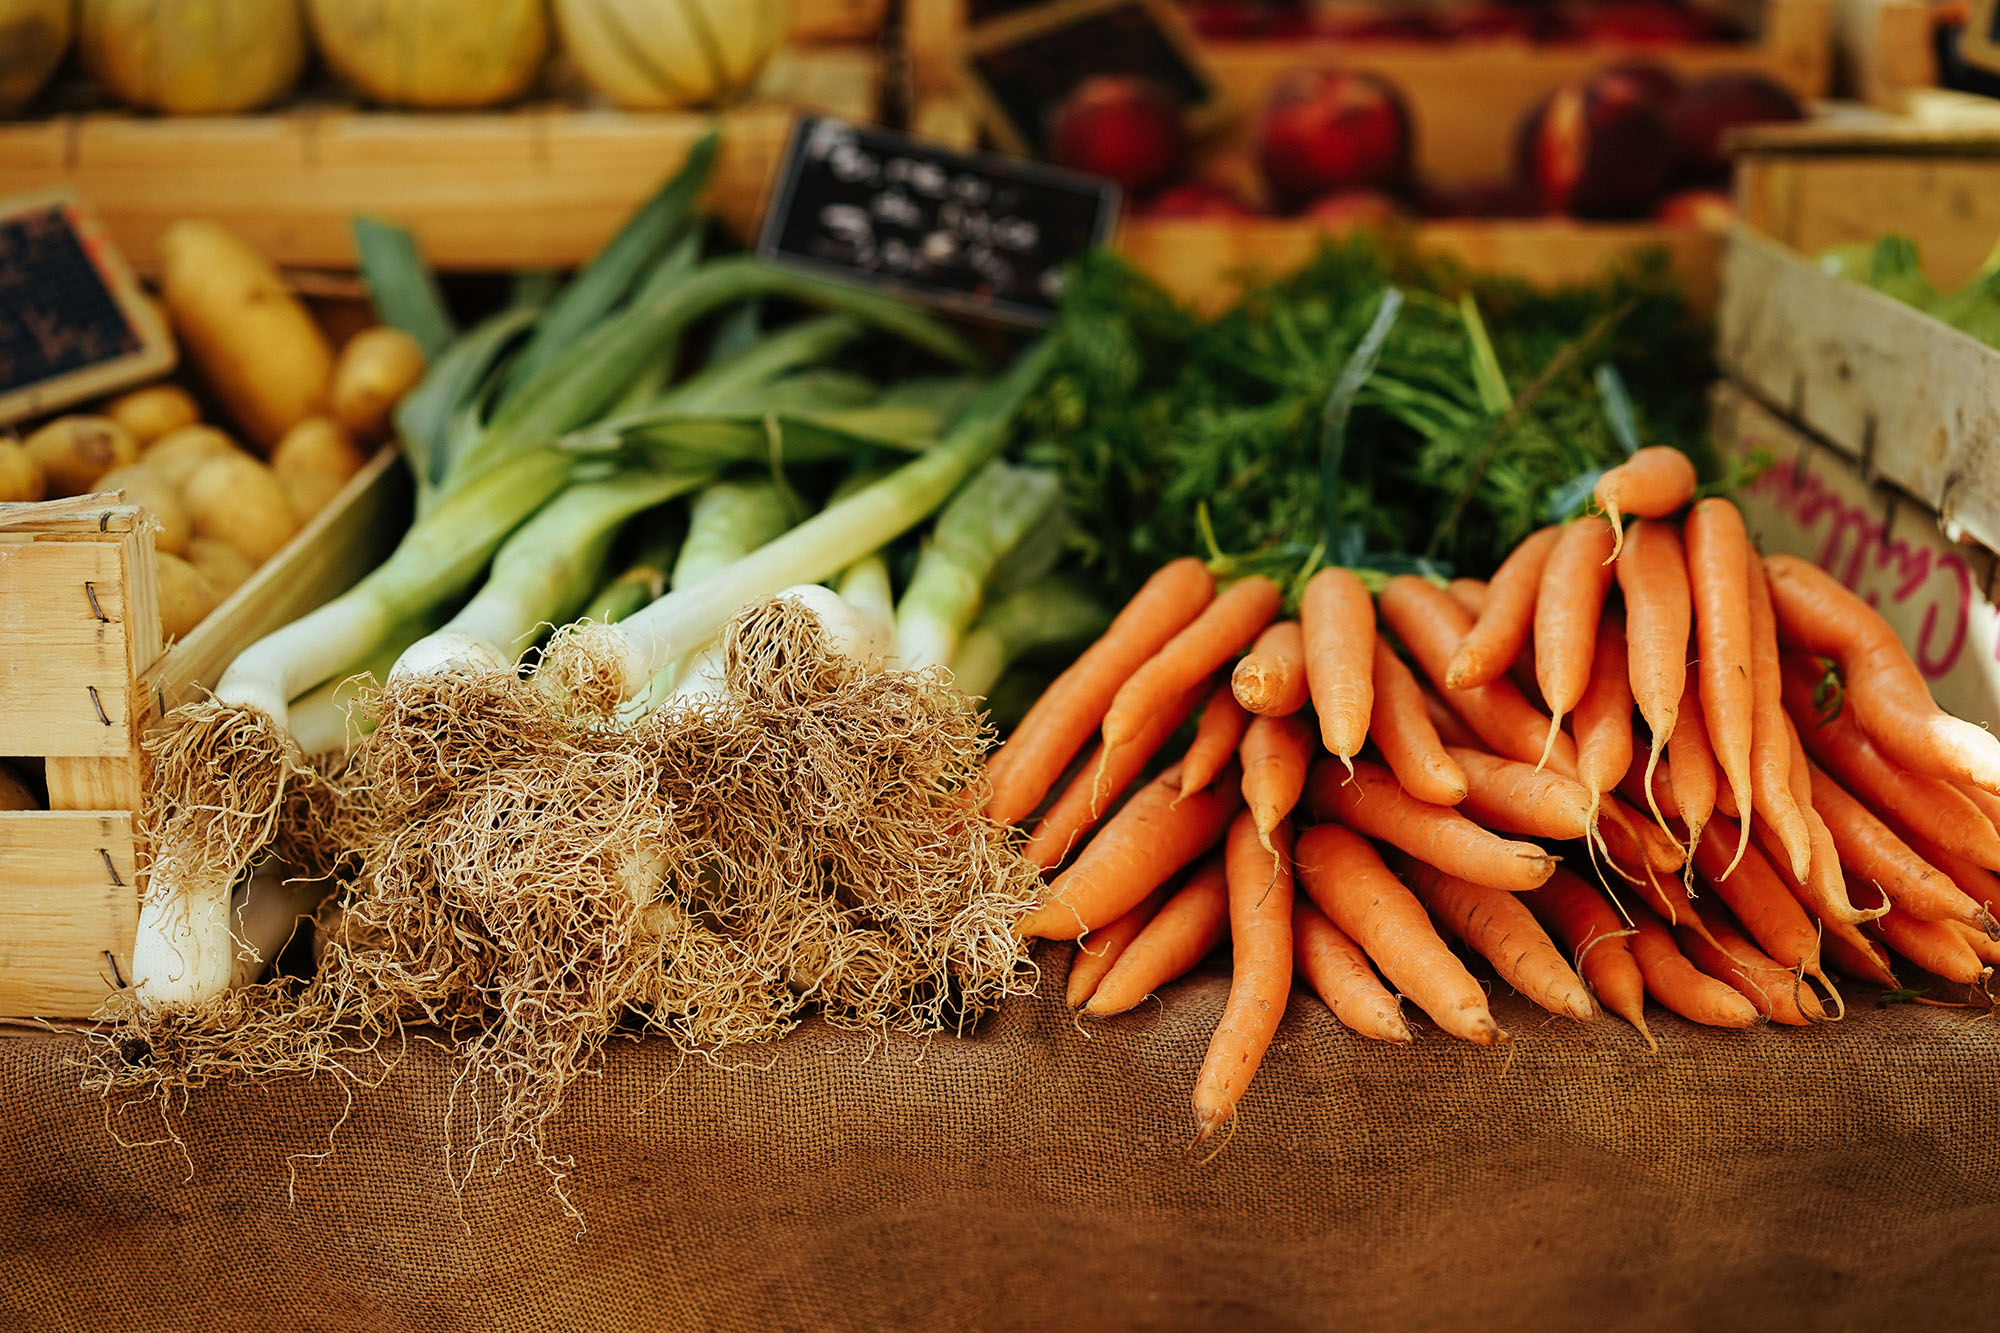 minehead-farmers-market-somerset-farmers-food-producers.jpg